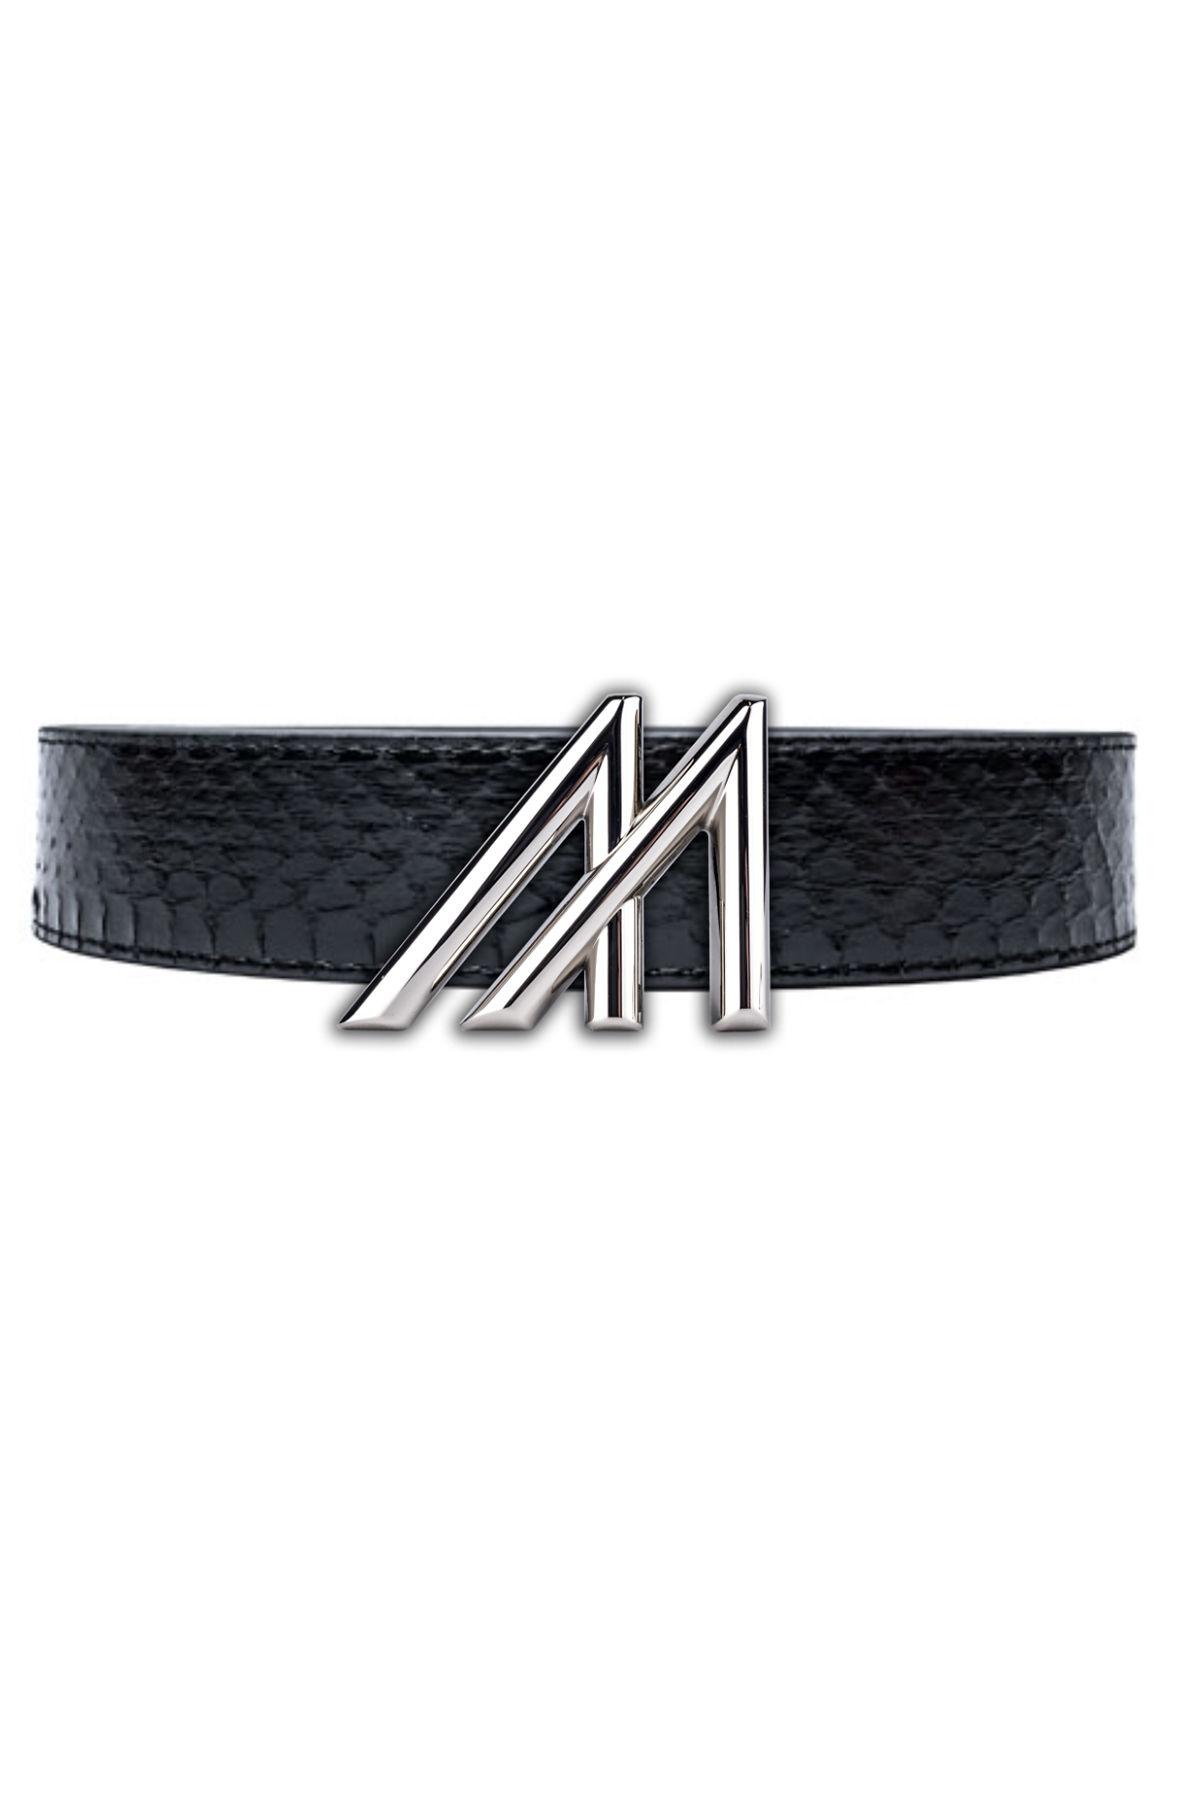 Image of Mint King Cobra Belt - Platinum M